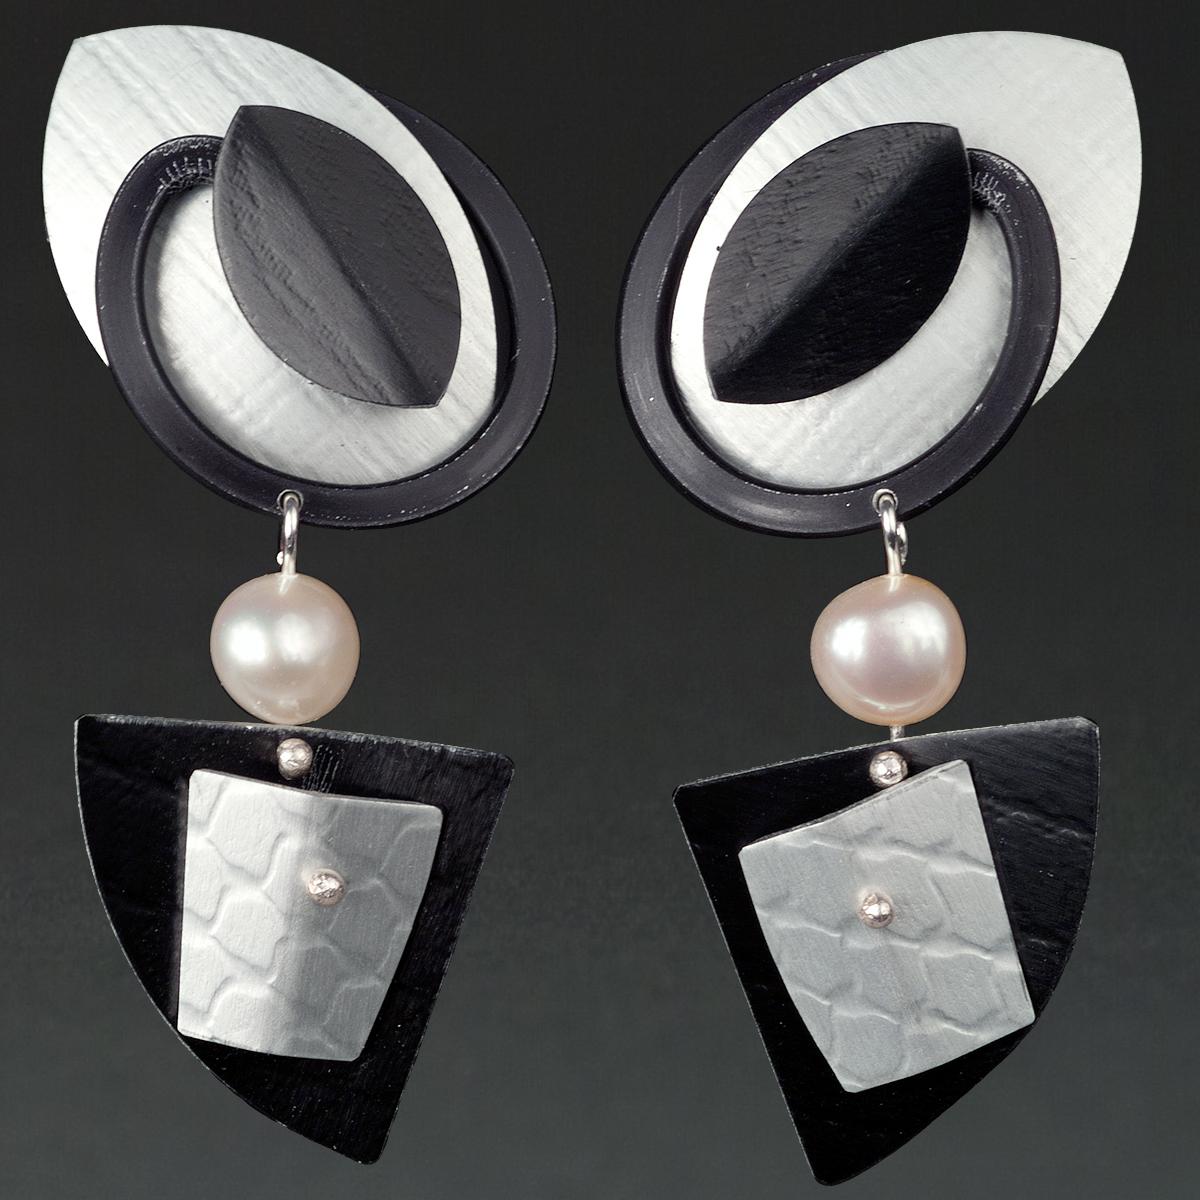 A - Silver, Black